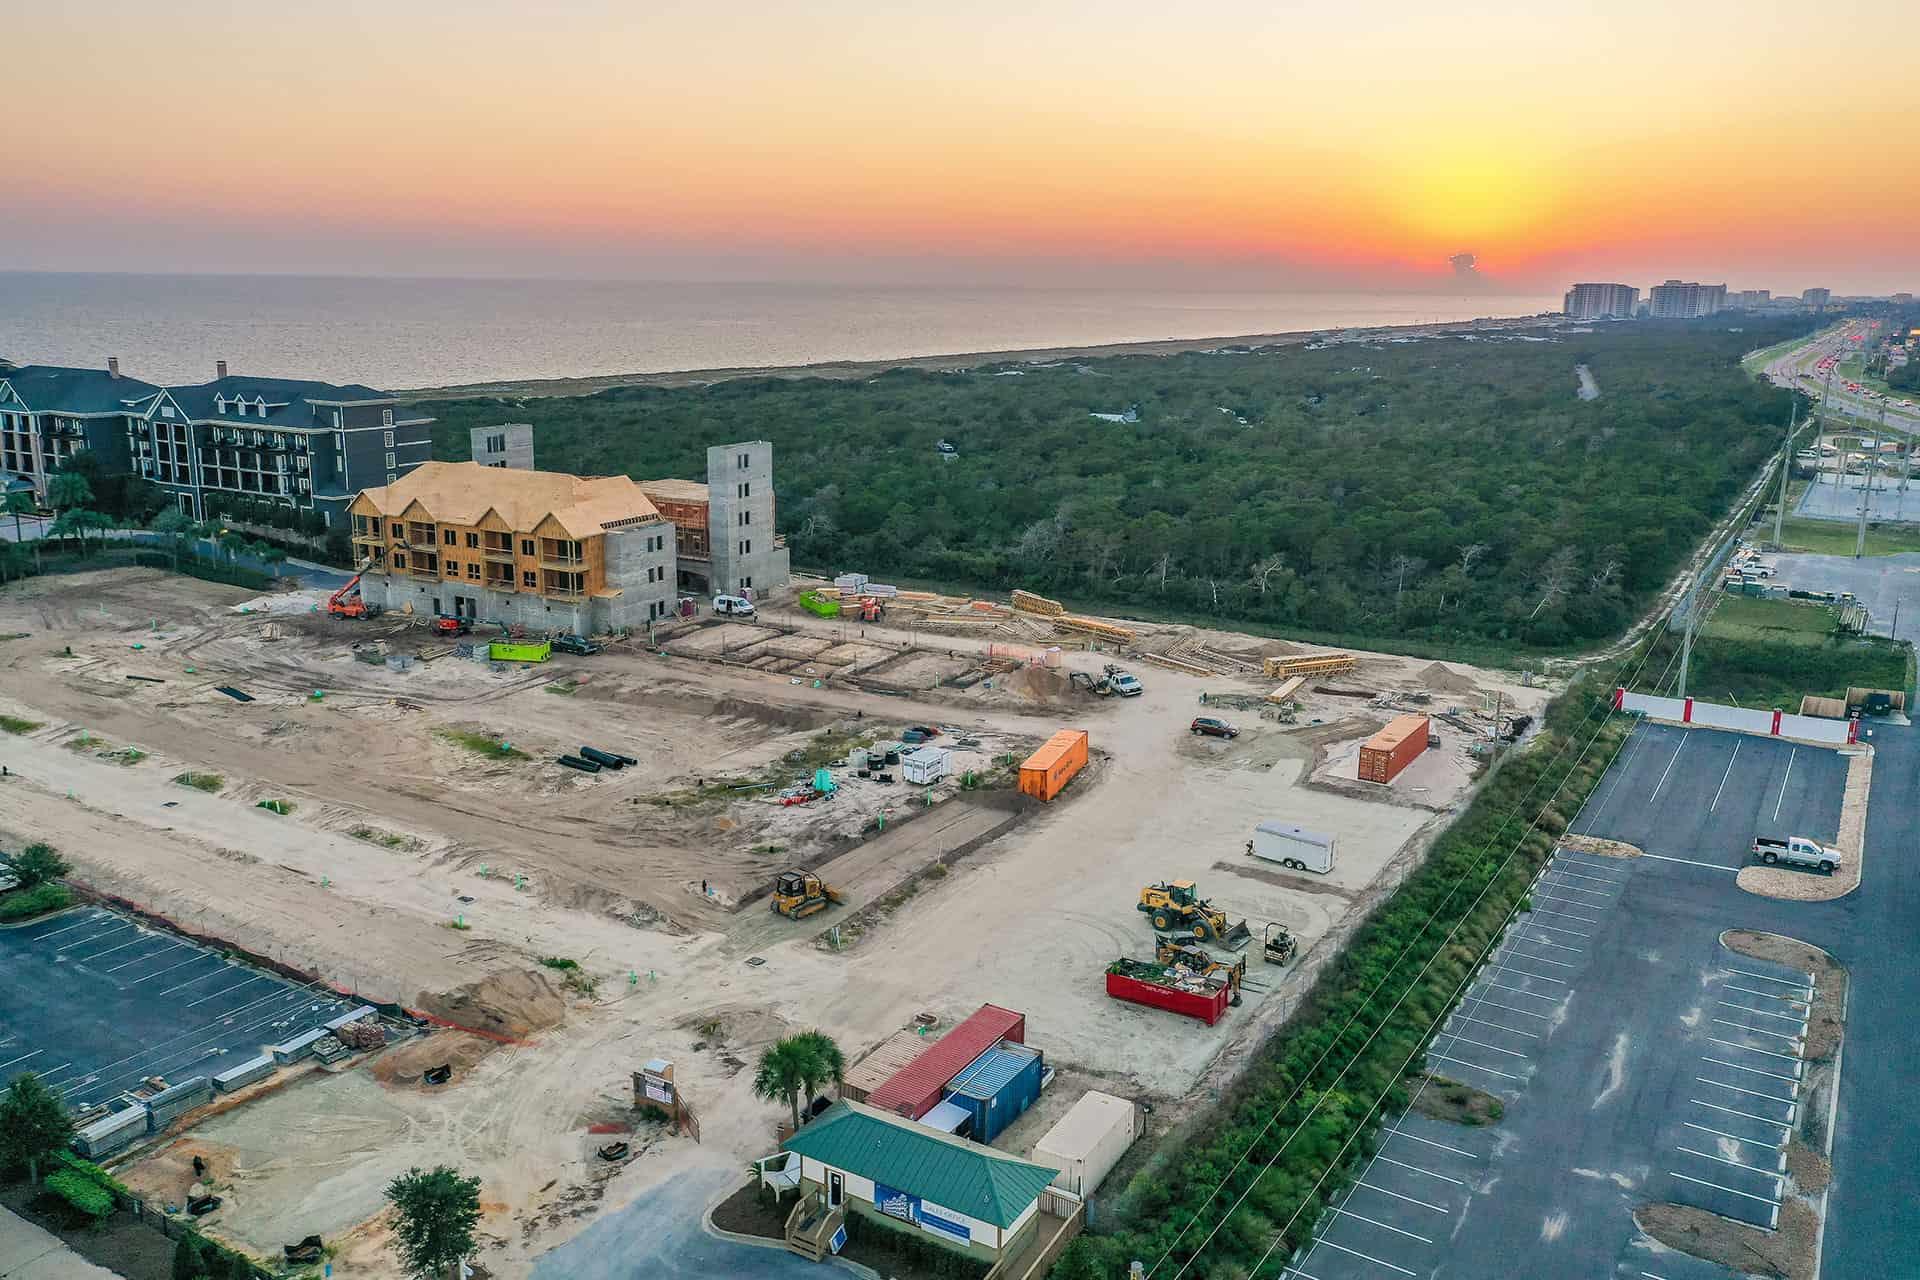 Parkside construction progress photo at dusk